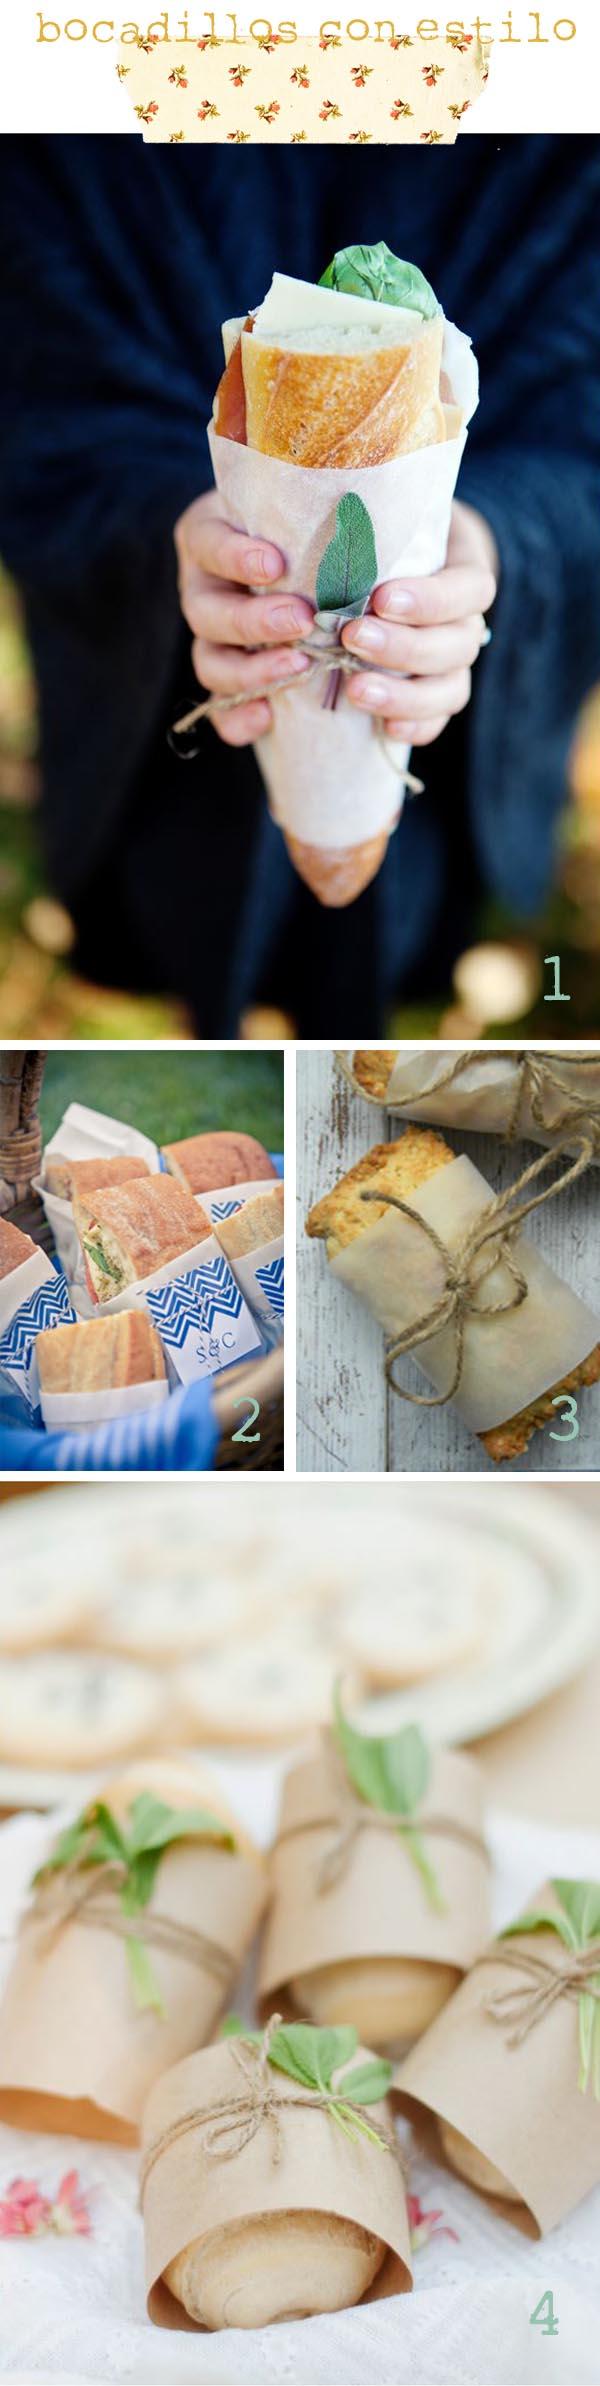 ideas para picnic bocadillos